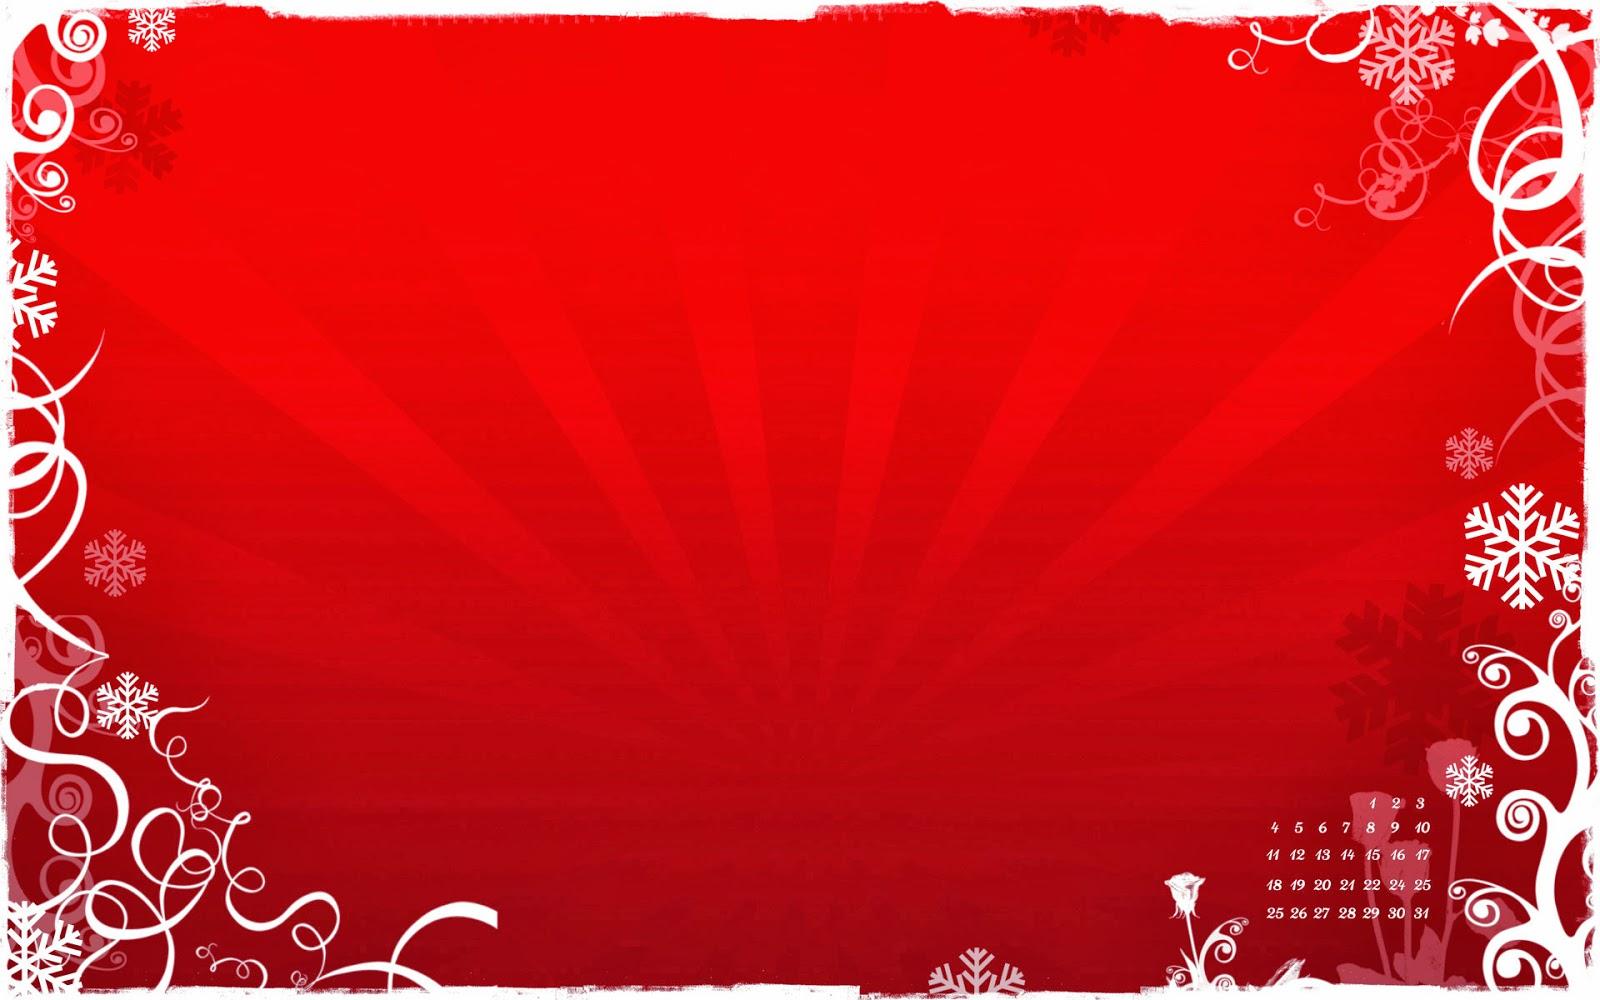 Hd Wallpapers Desktop Red Background Hd Desktop Wallpapers